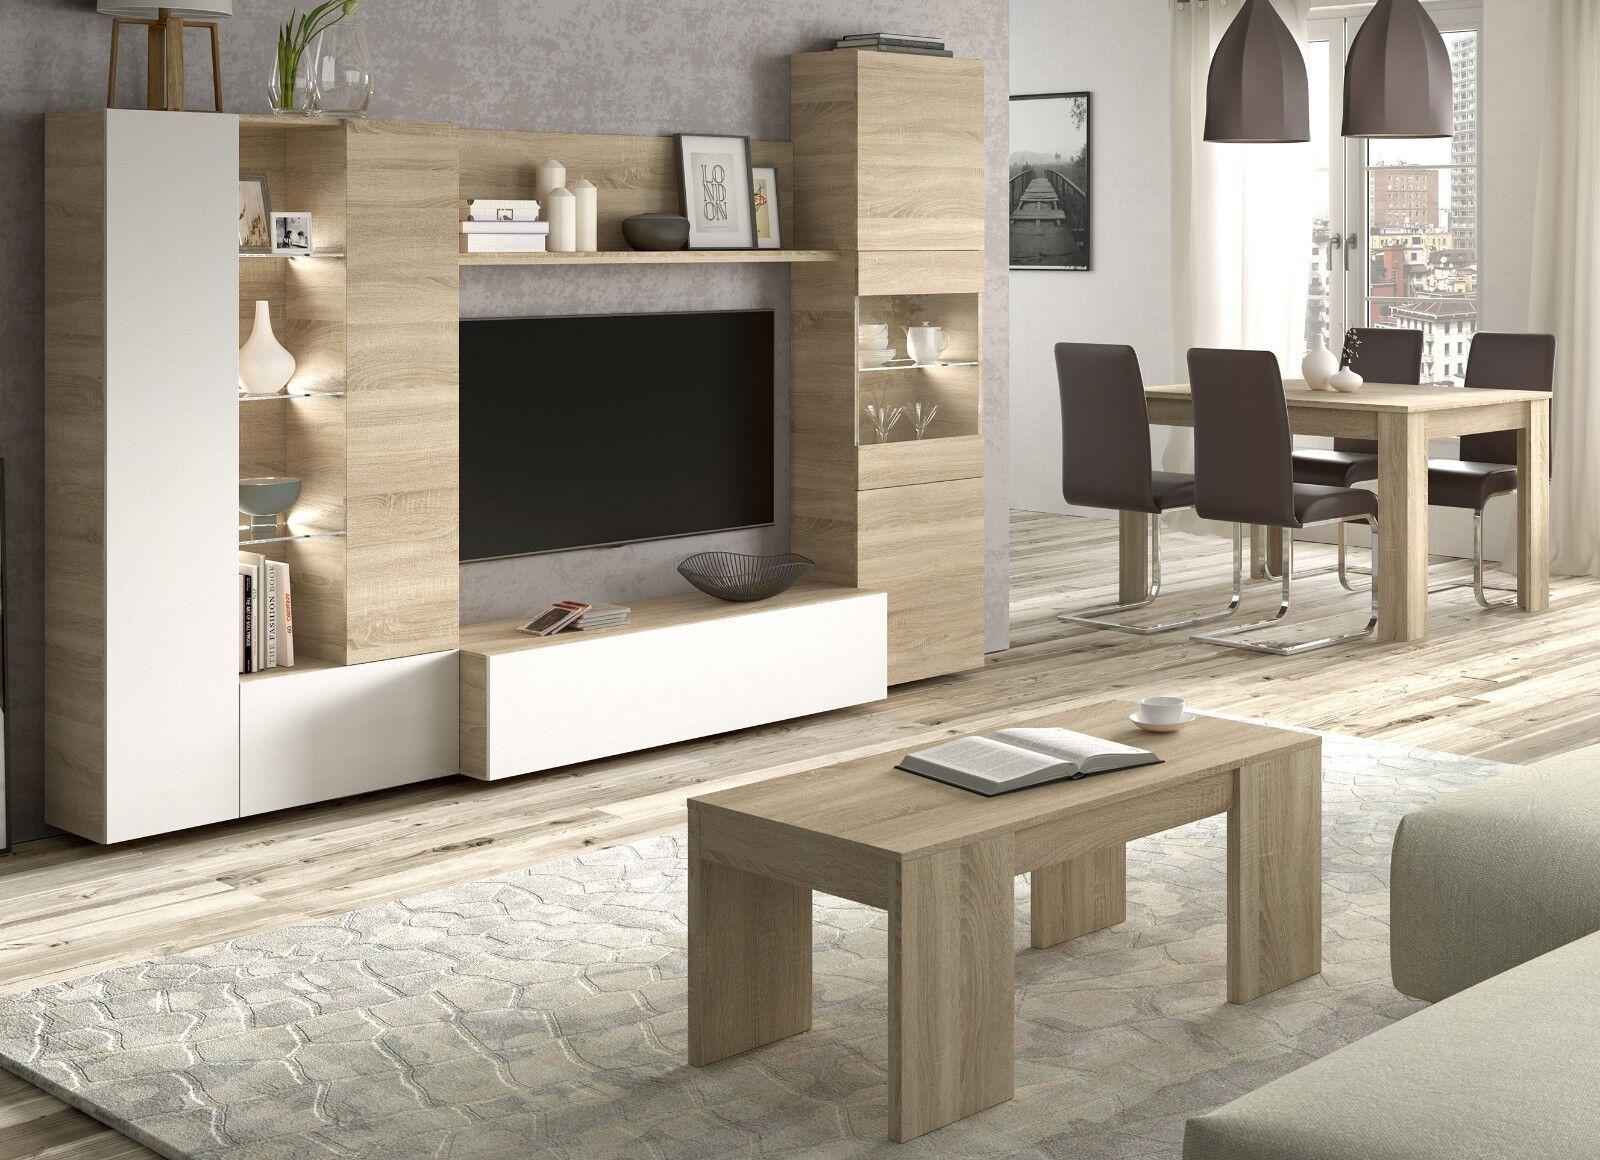 Pack mobiliario salon comedor con luz LED mueble TV mesa centro y...